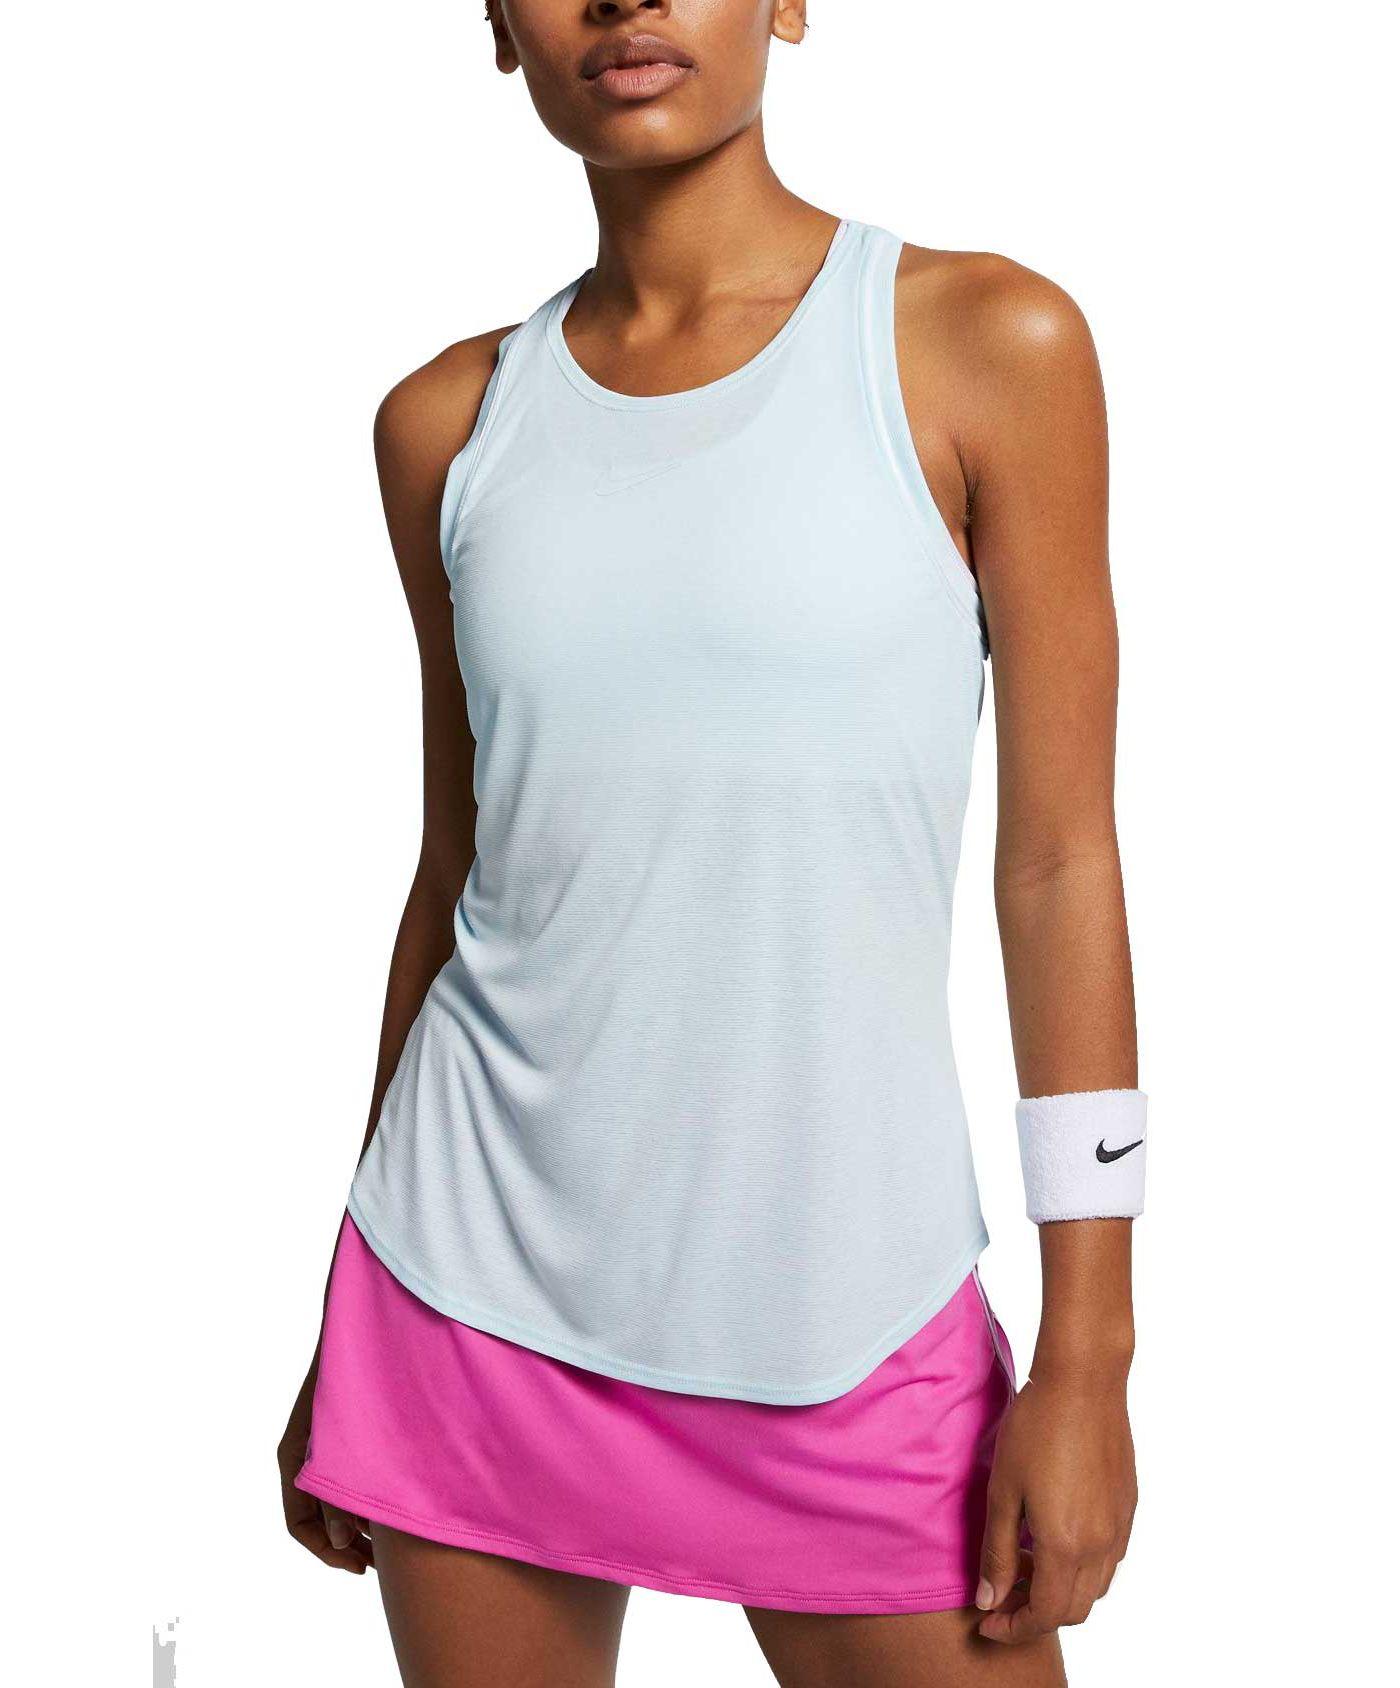 Nike Women's Court Dri-FIT Tennis Tank Top